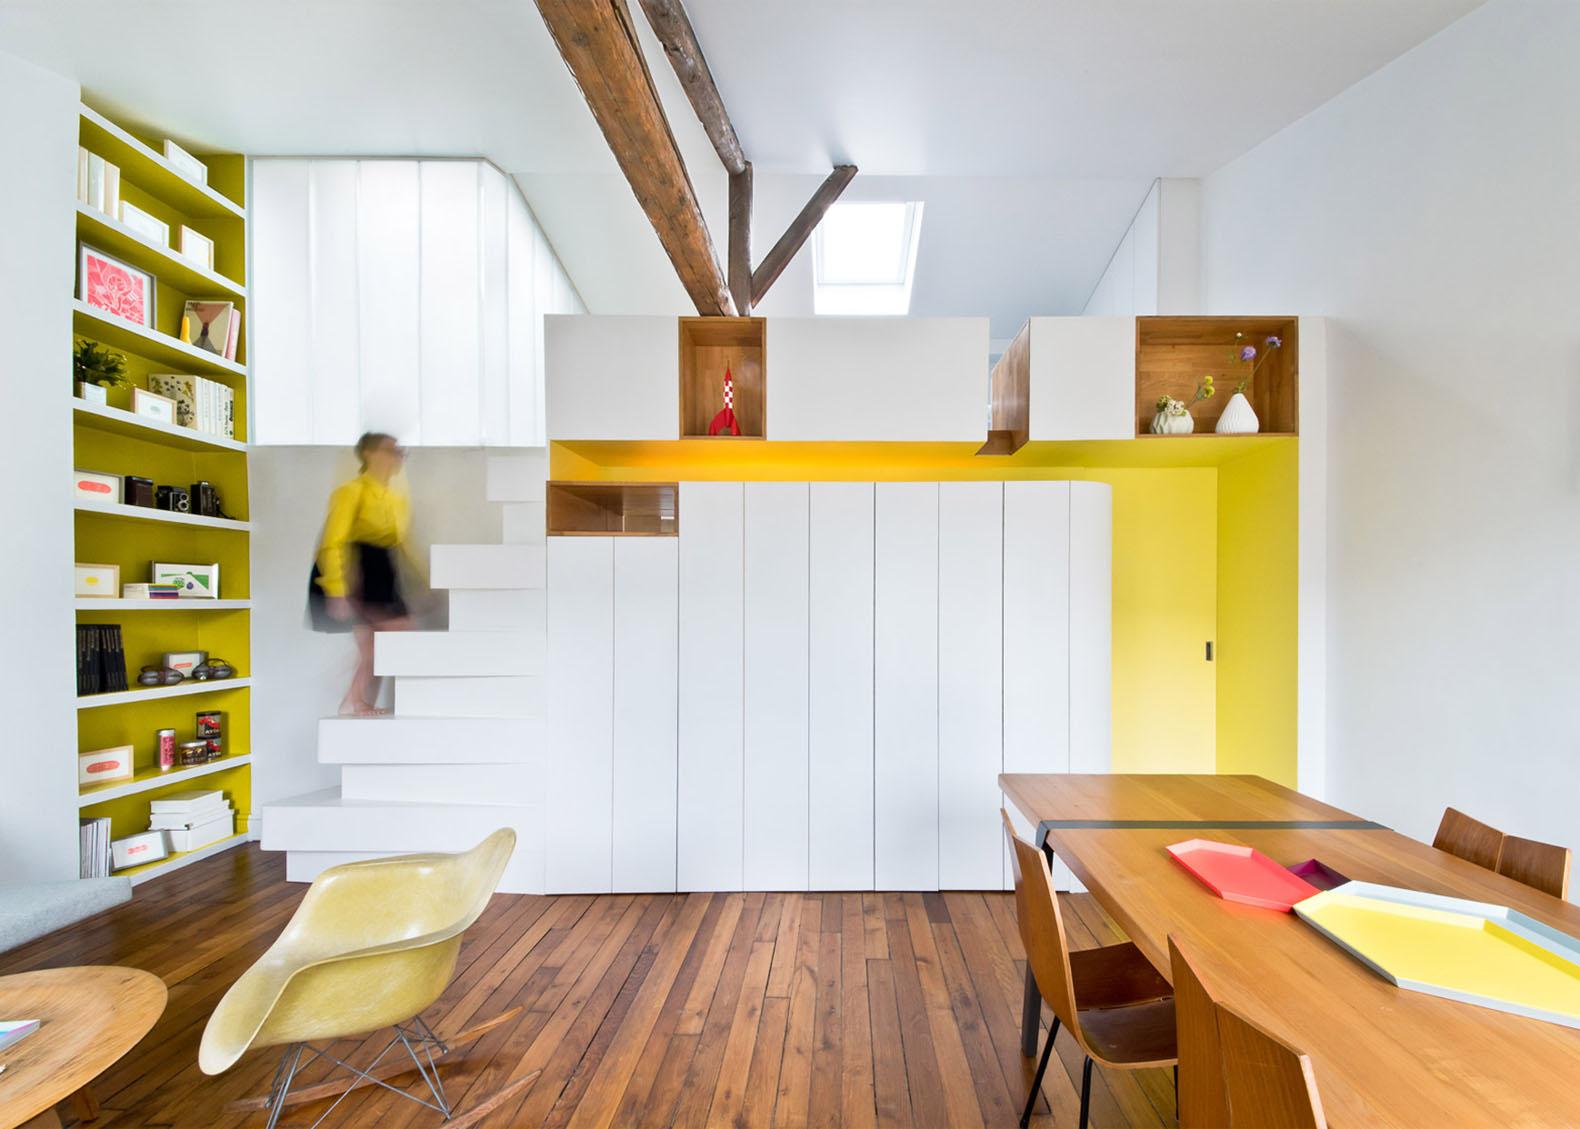 Multifunctional Furniture Inhabitat Green Design Innovation Architecture Green Building